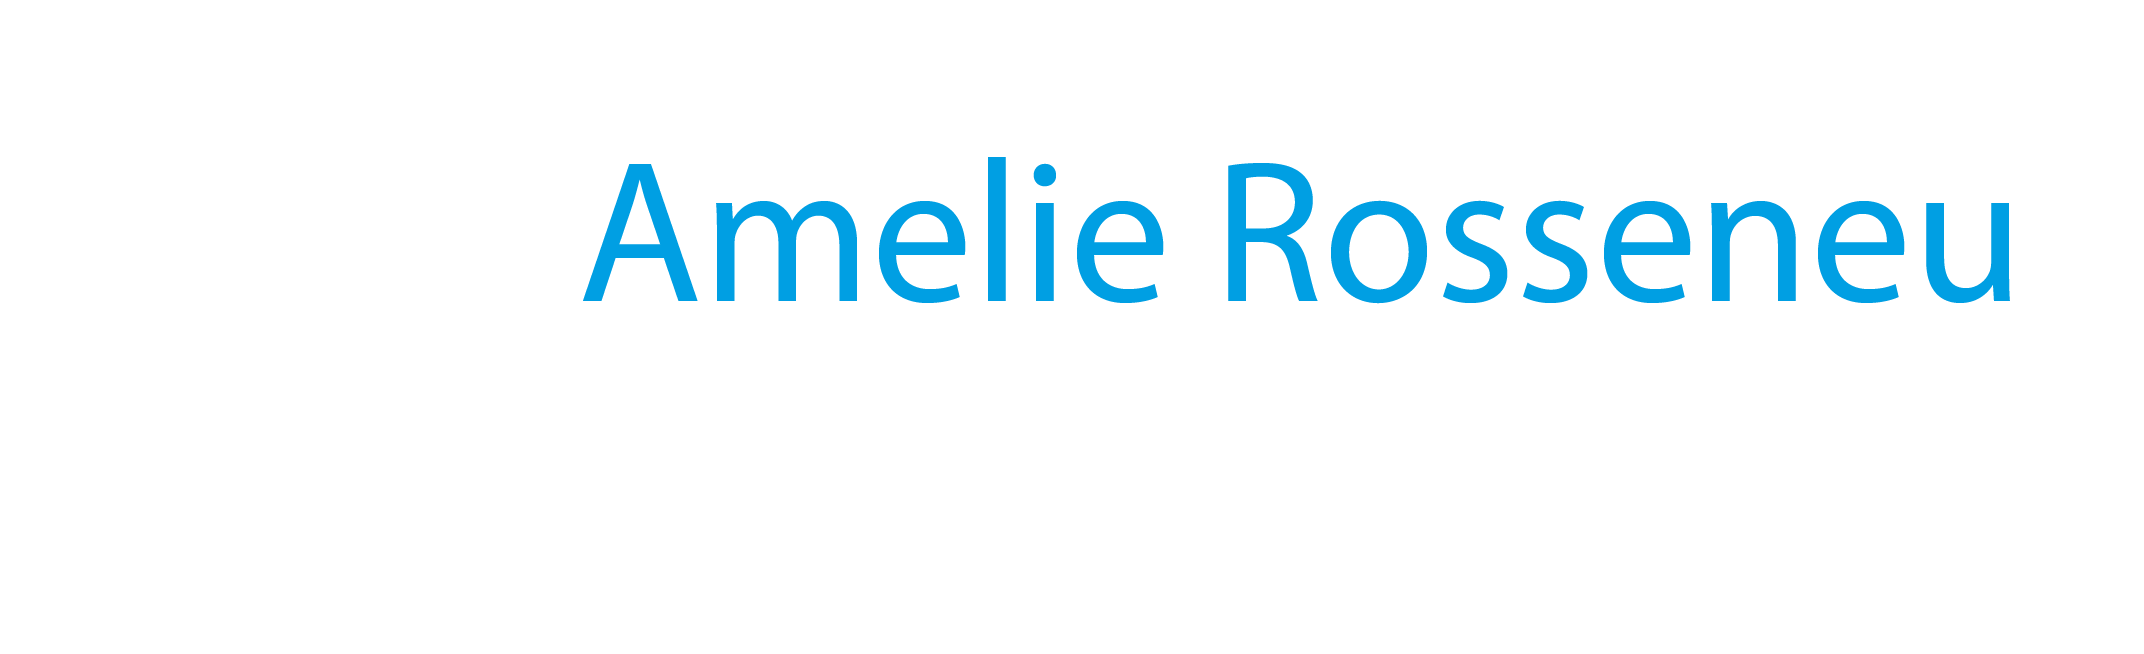 Amelie Rosseneu